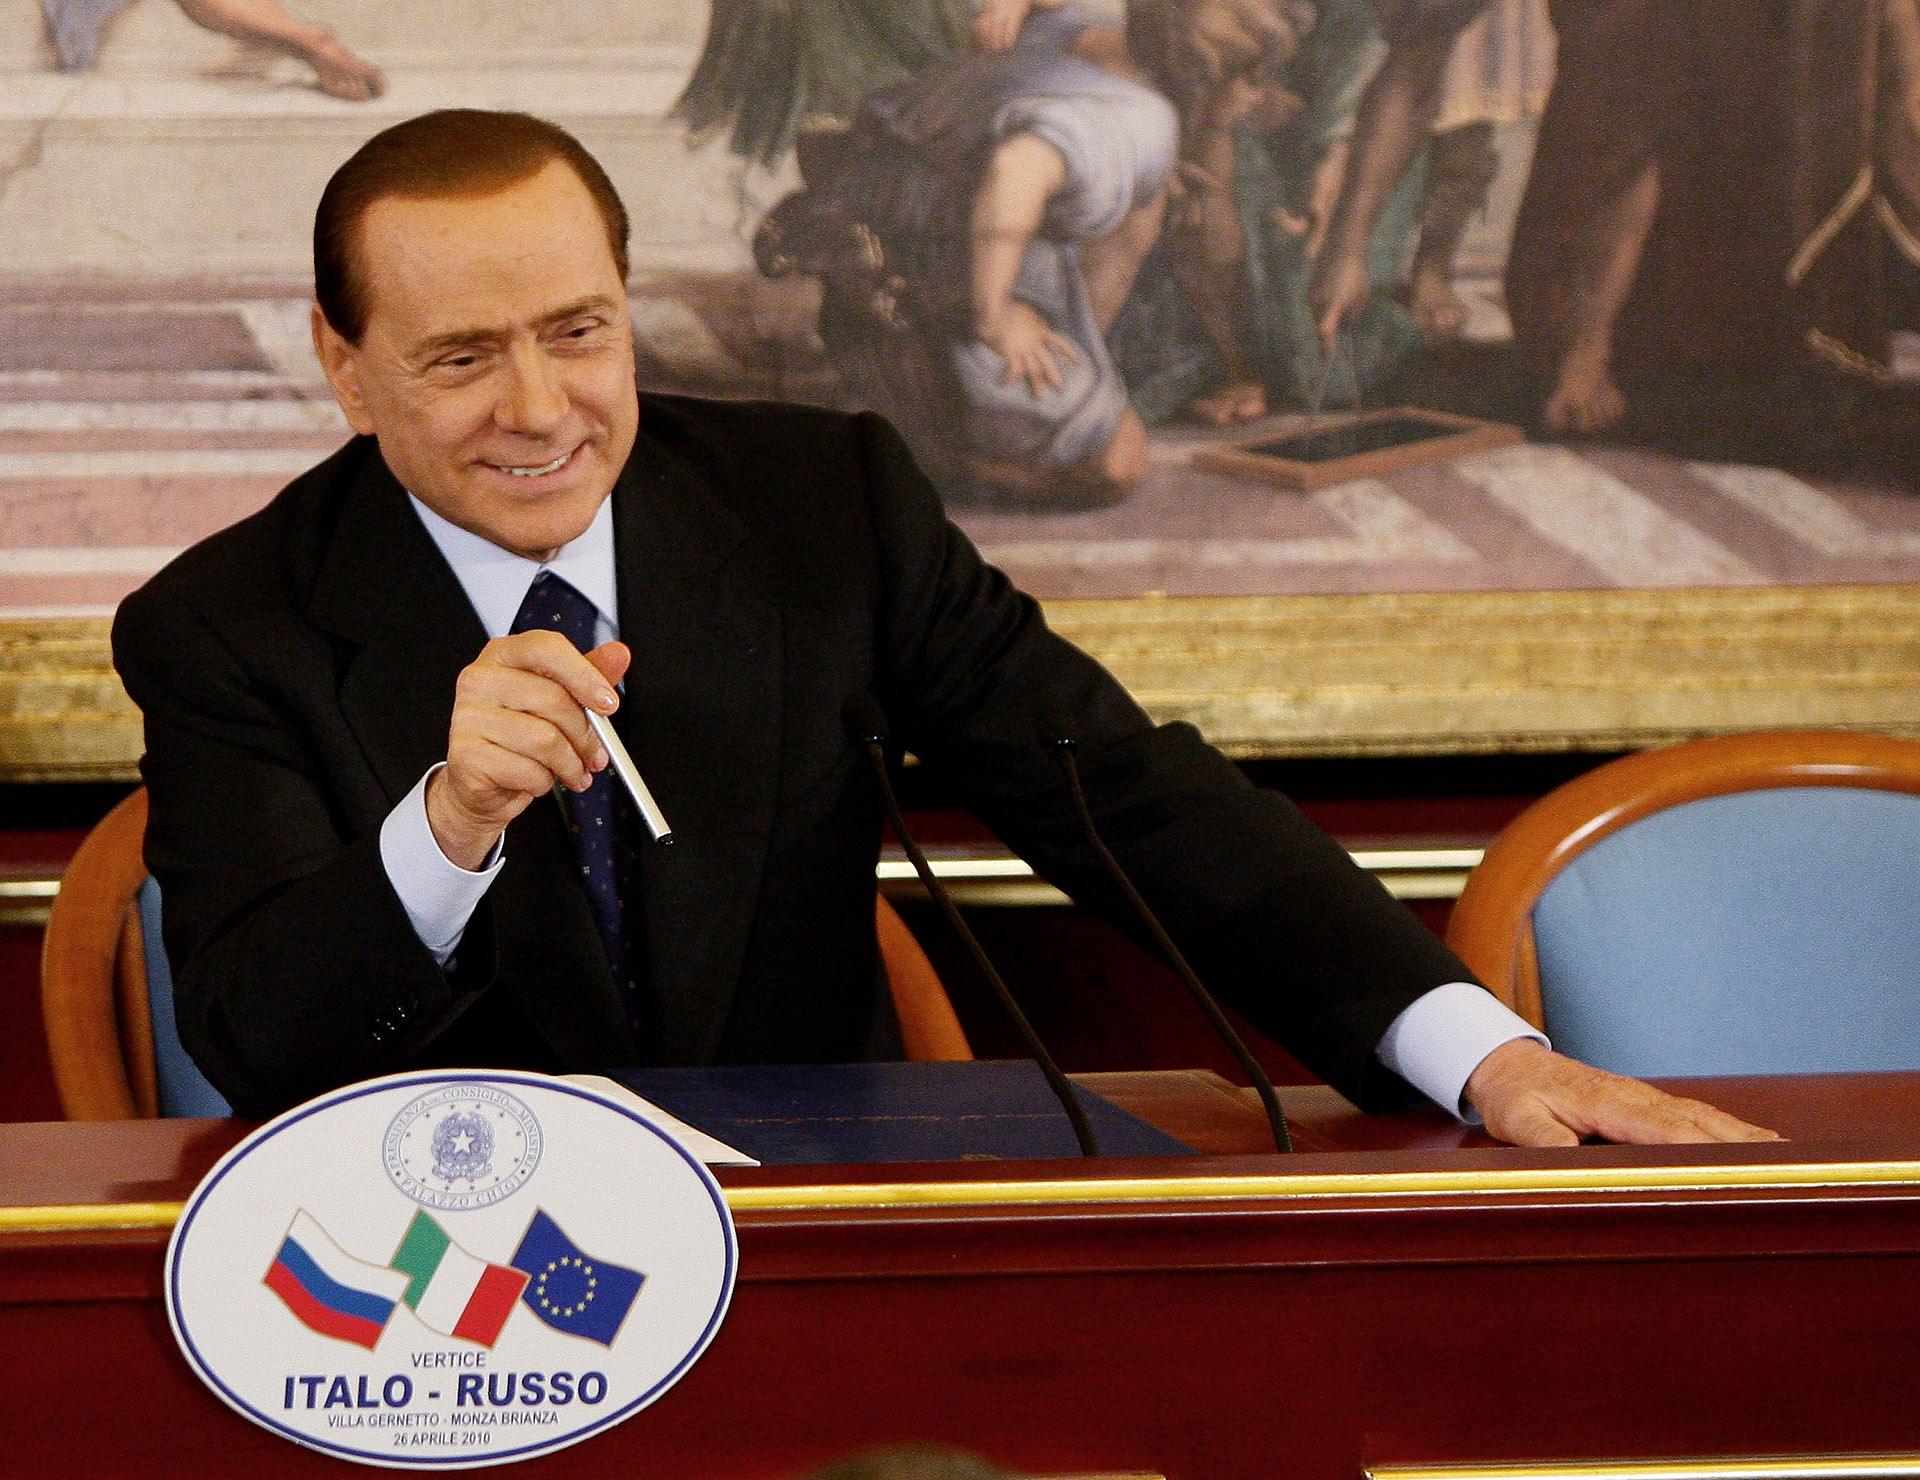 Silvio Berlusconi, ex primer ministro italino, y sus sugestivo implante capilar (Vittorio Zunino Celotto/Getty Images)